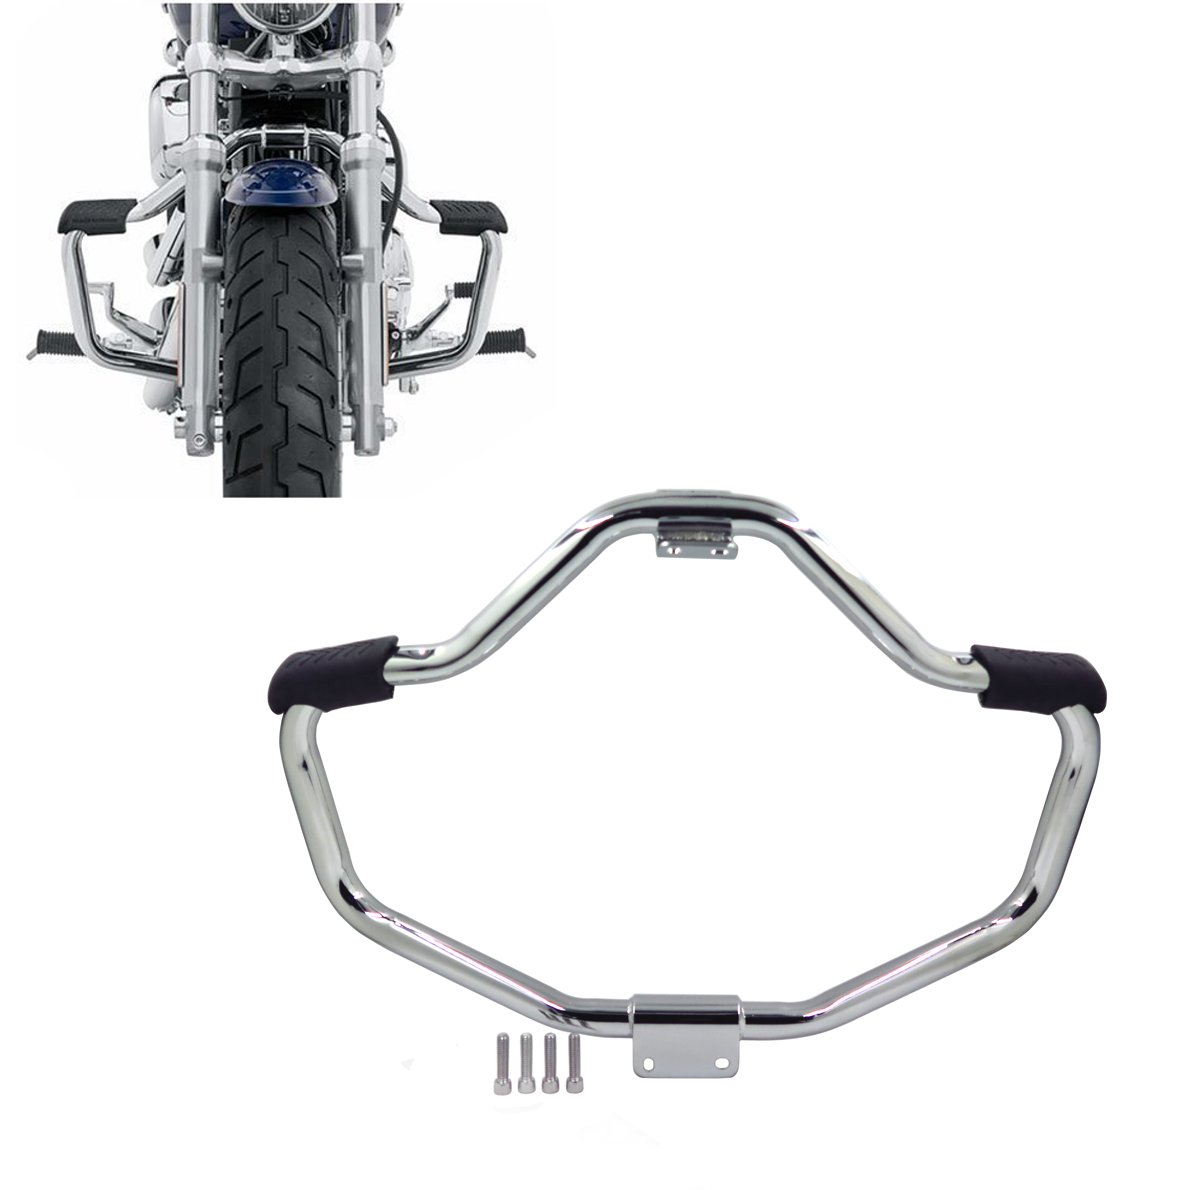 HTT Group Motorcycle Chrome Front Crash Bar Saftey Bars Protection Tube For 2004-2016 Harley Davidson Sportster Iron 883 XL883N XL1200N XL1200L 48 XL1200X